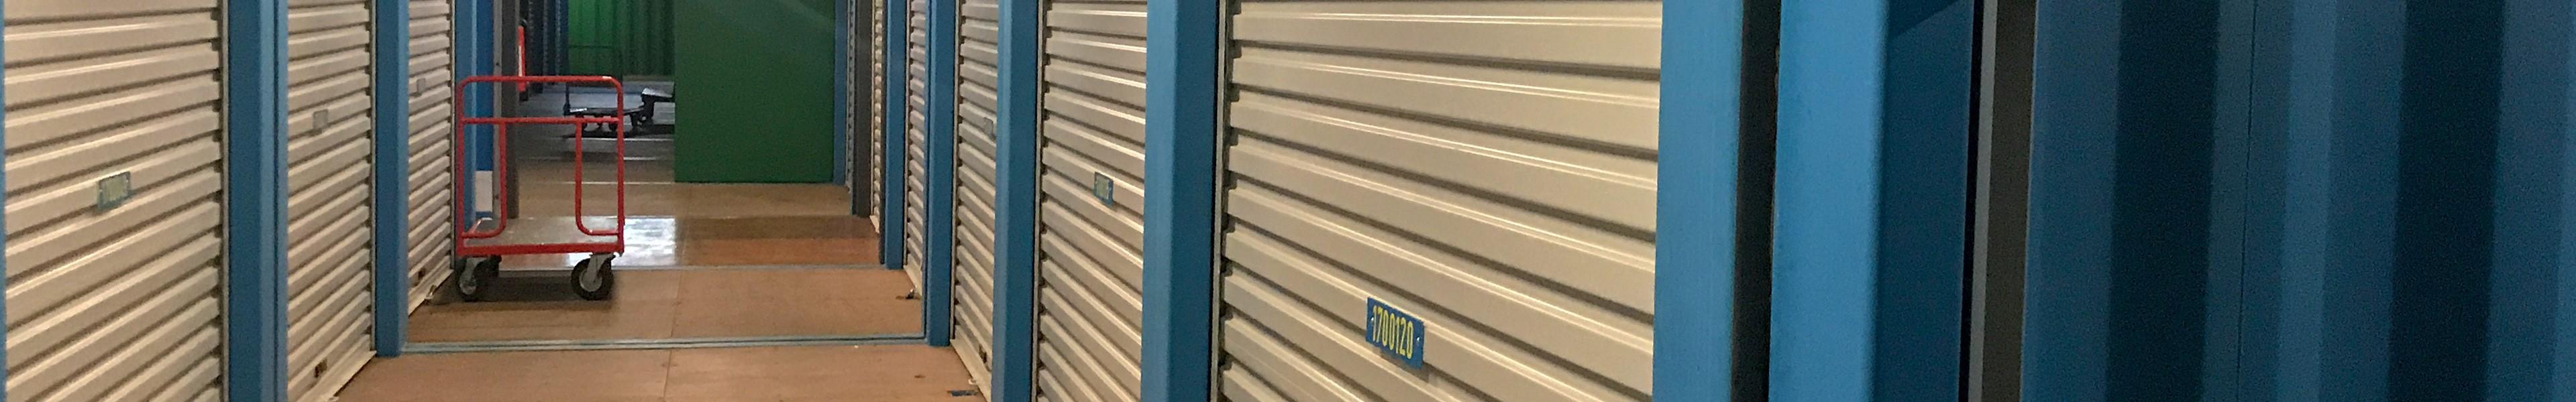 Self Storage Hos Titan Herning